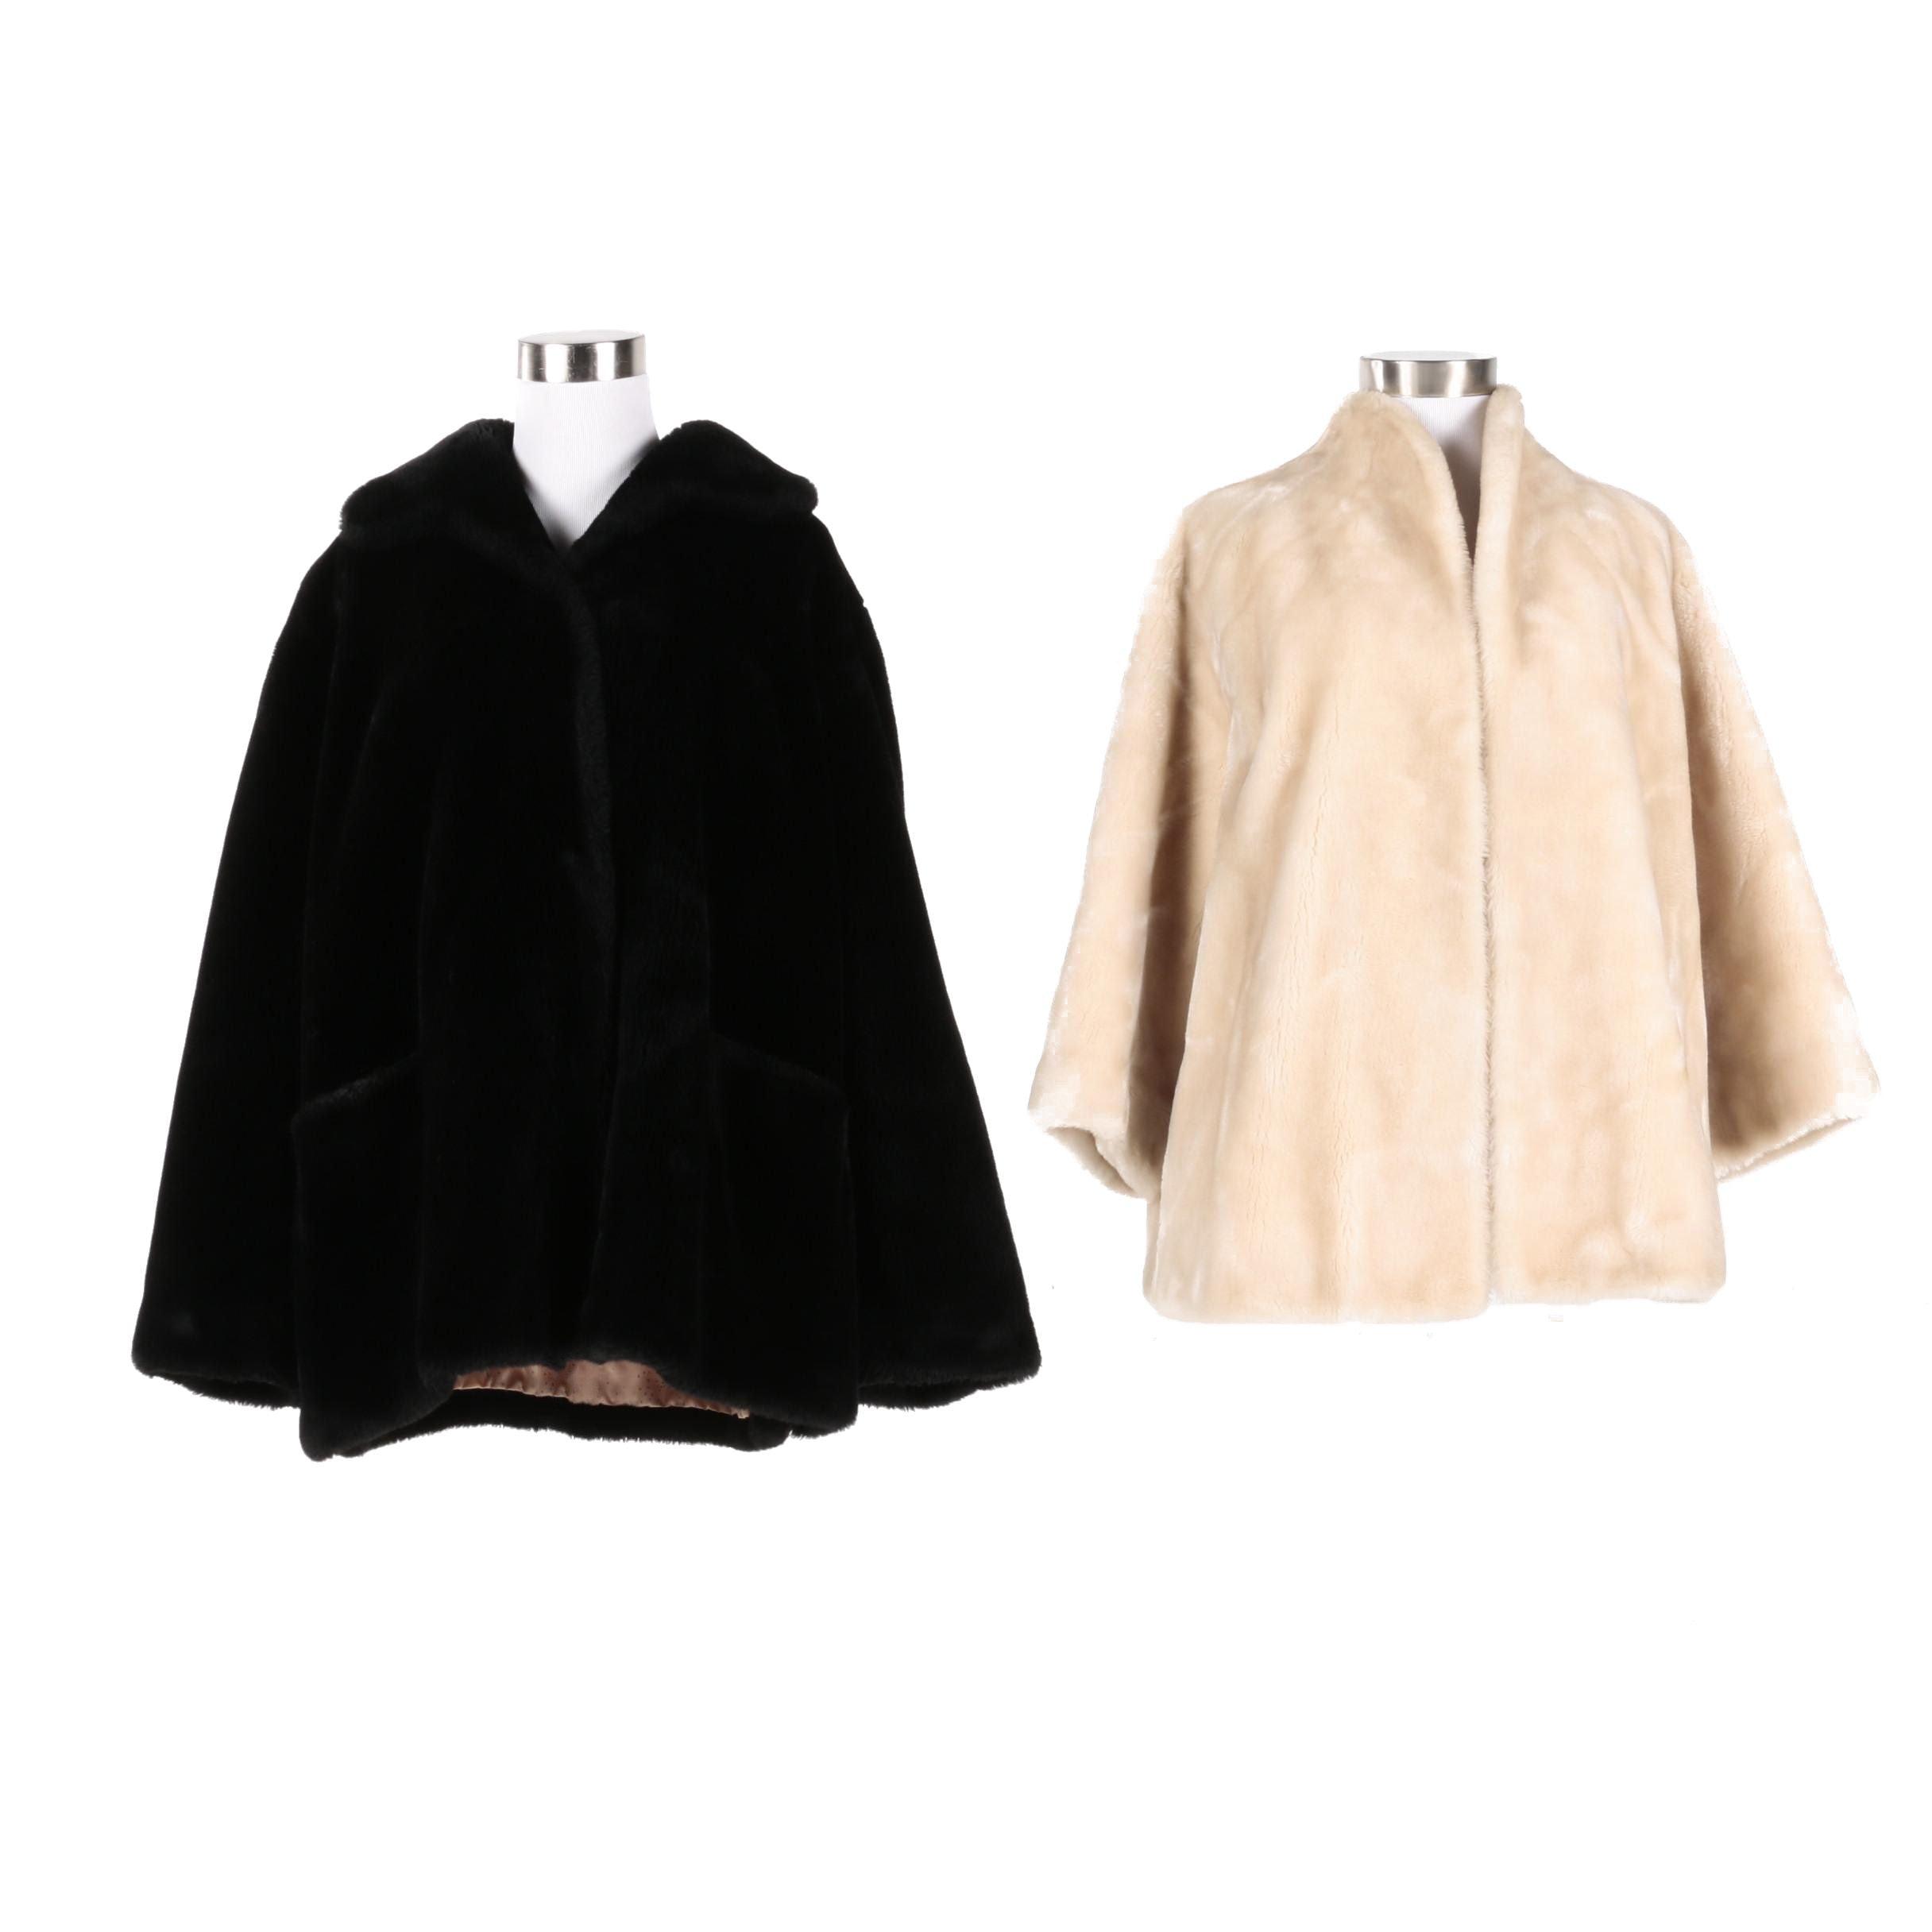 Vintage Borgana Faux Fur Coats